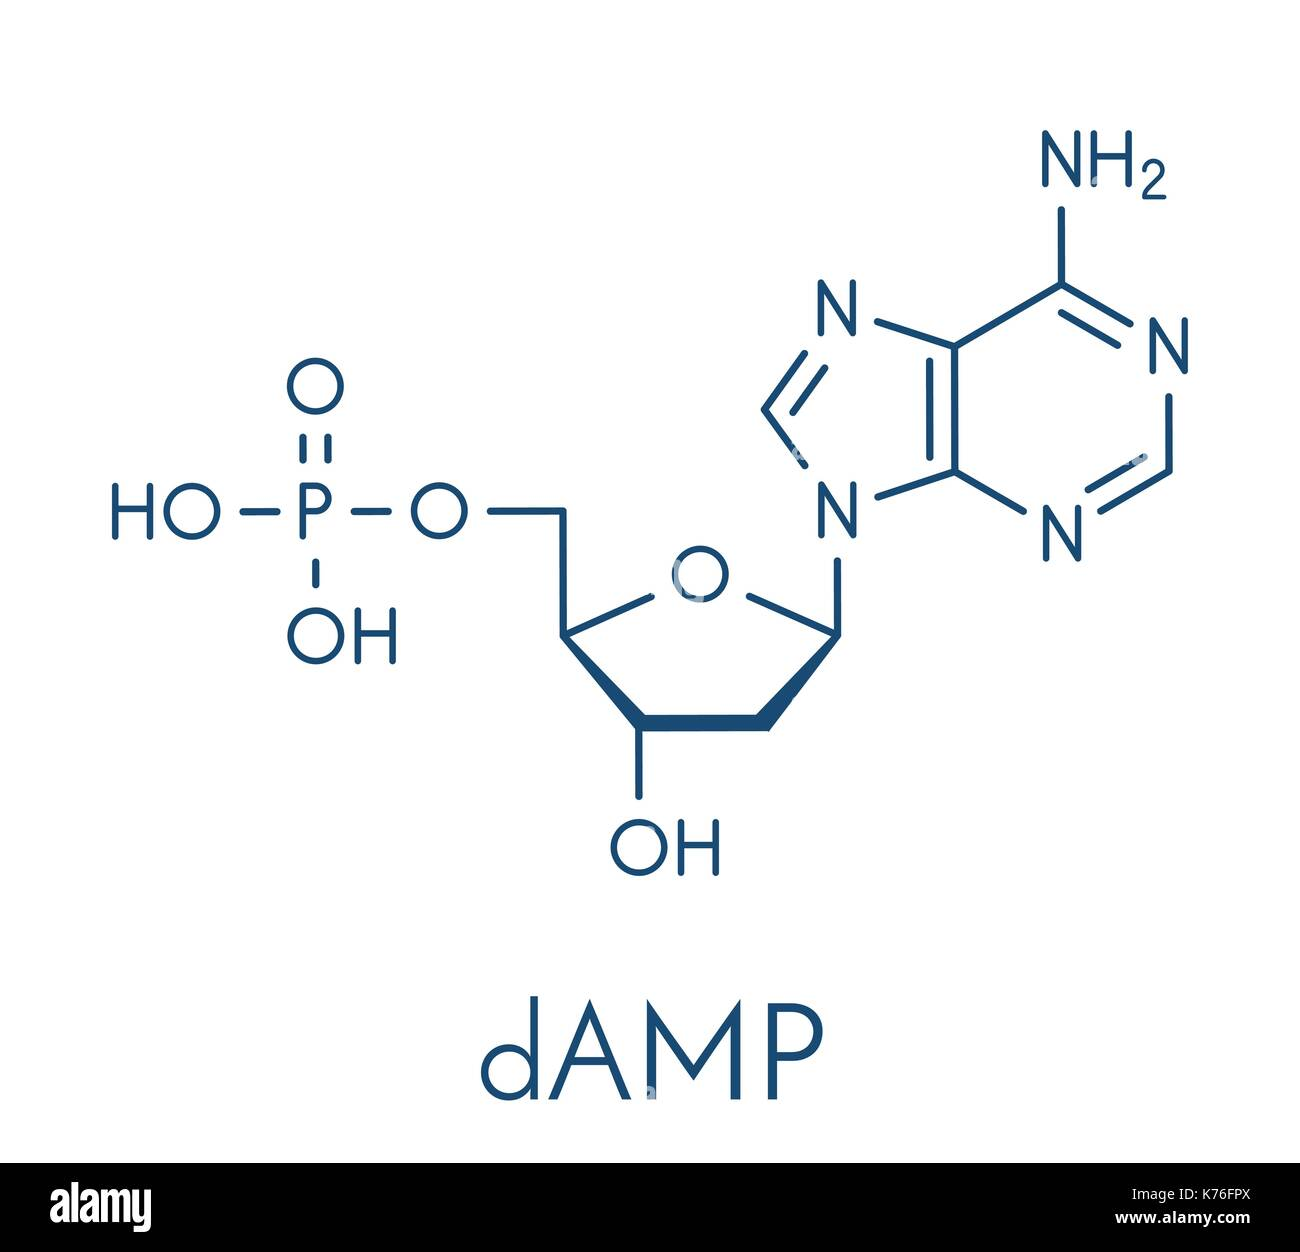 Deoxyadenosine monophosphate (dAMP) nucleotide molecule. DNA building block. Skeletal formula. - Stock Vector